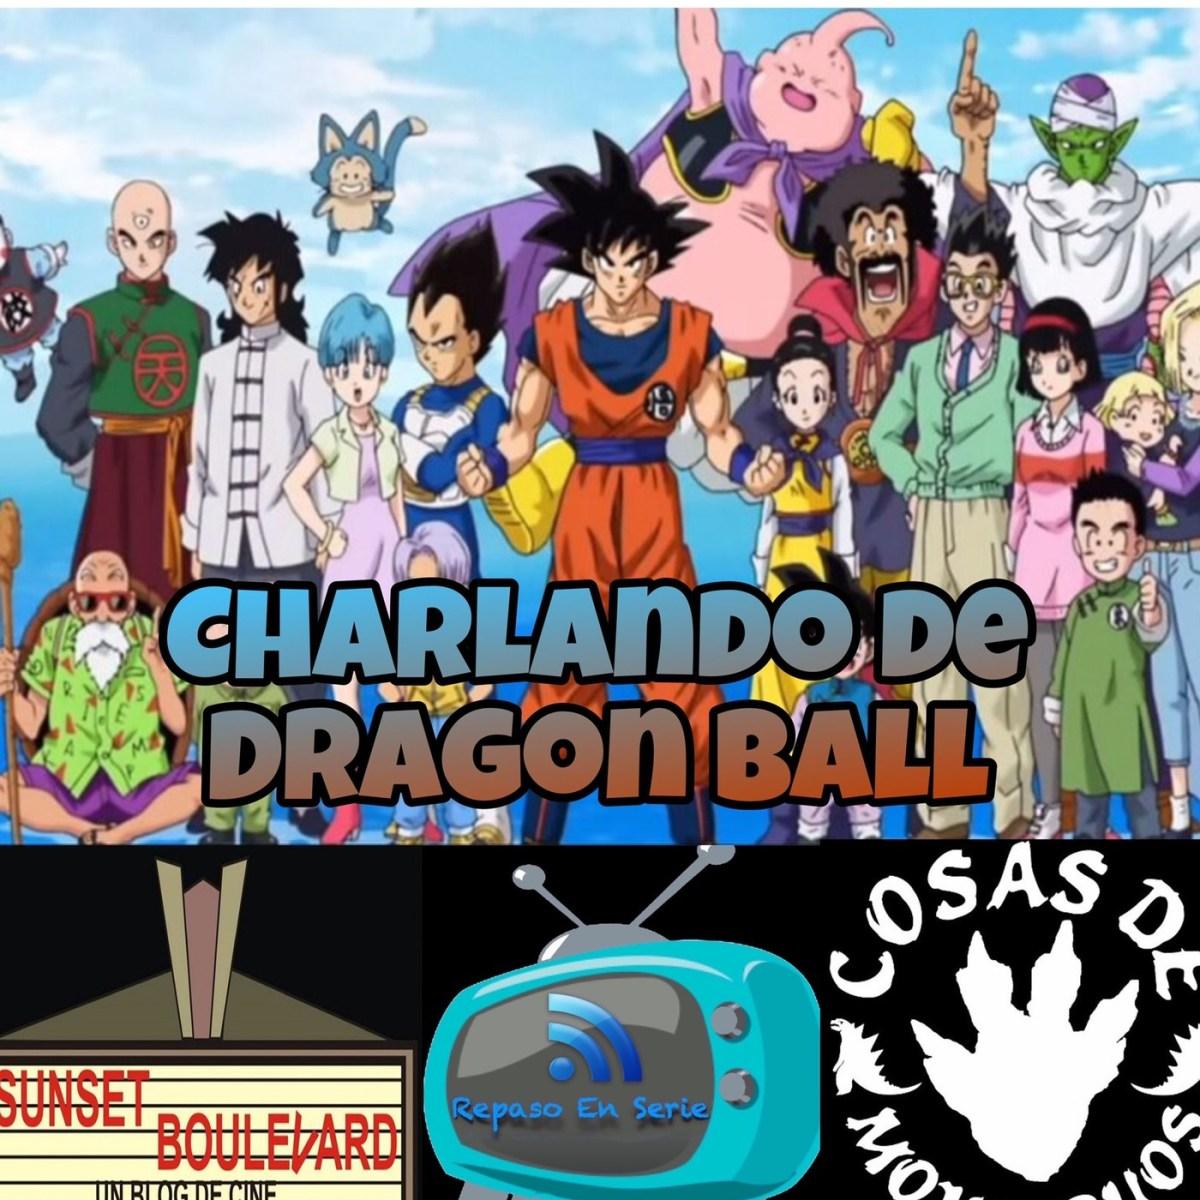 Sunset Boulevard 430 – Hijos de Dragon Ball con @repasoenserie y @monsterianos